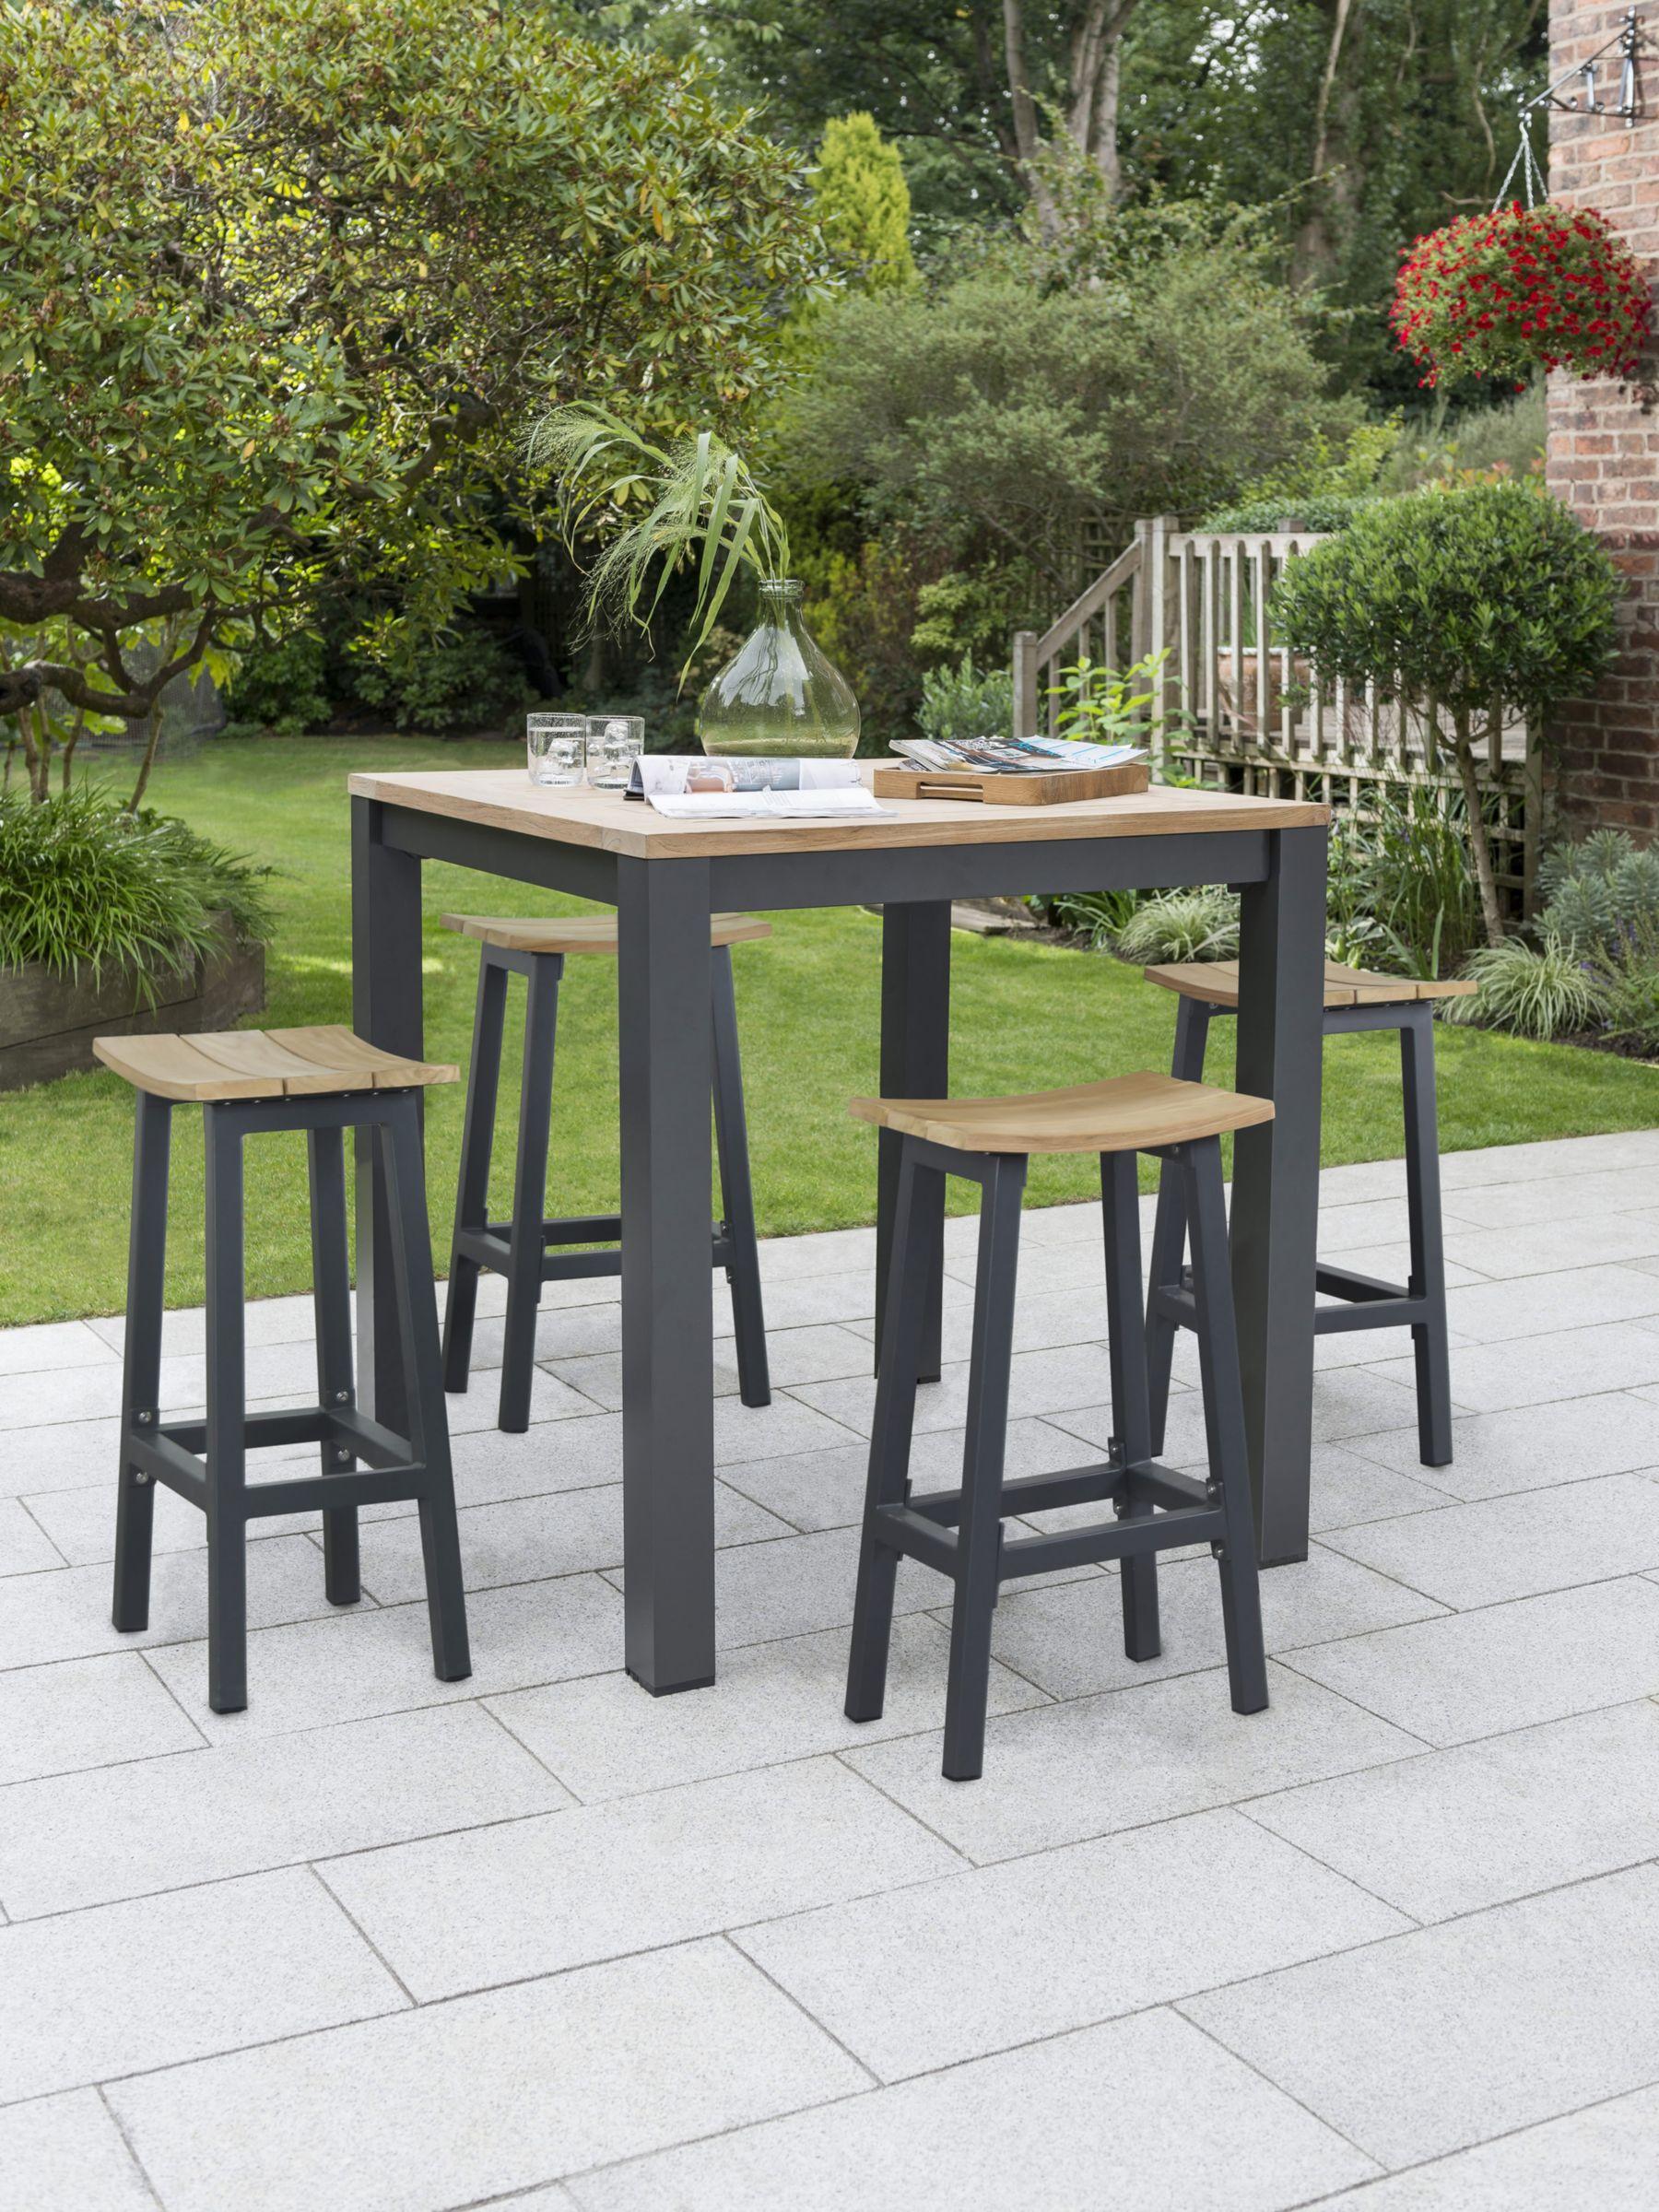 Kettler Elba 4 Seater High Dining Garden Table Stools Set Fsc Certified Teak Wood Grey Natural At John Lewis Partners